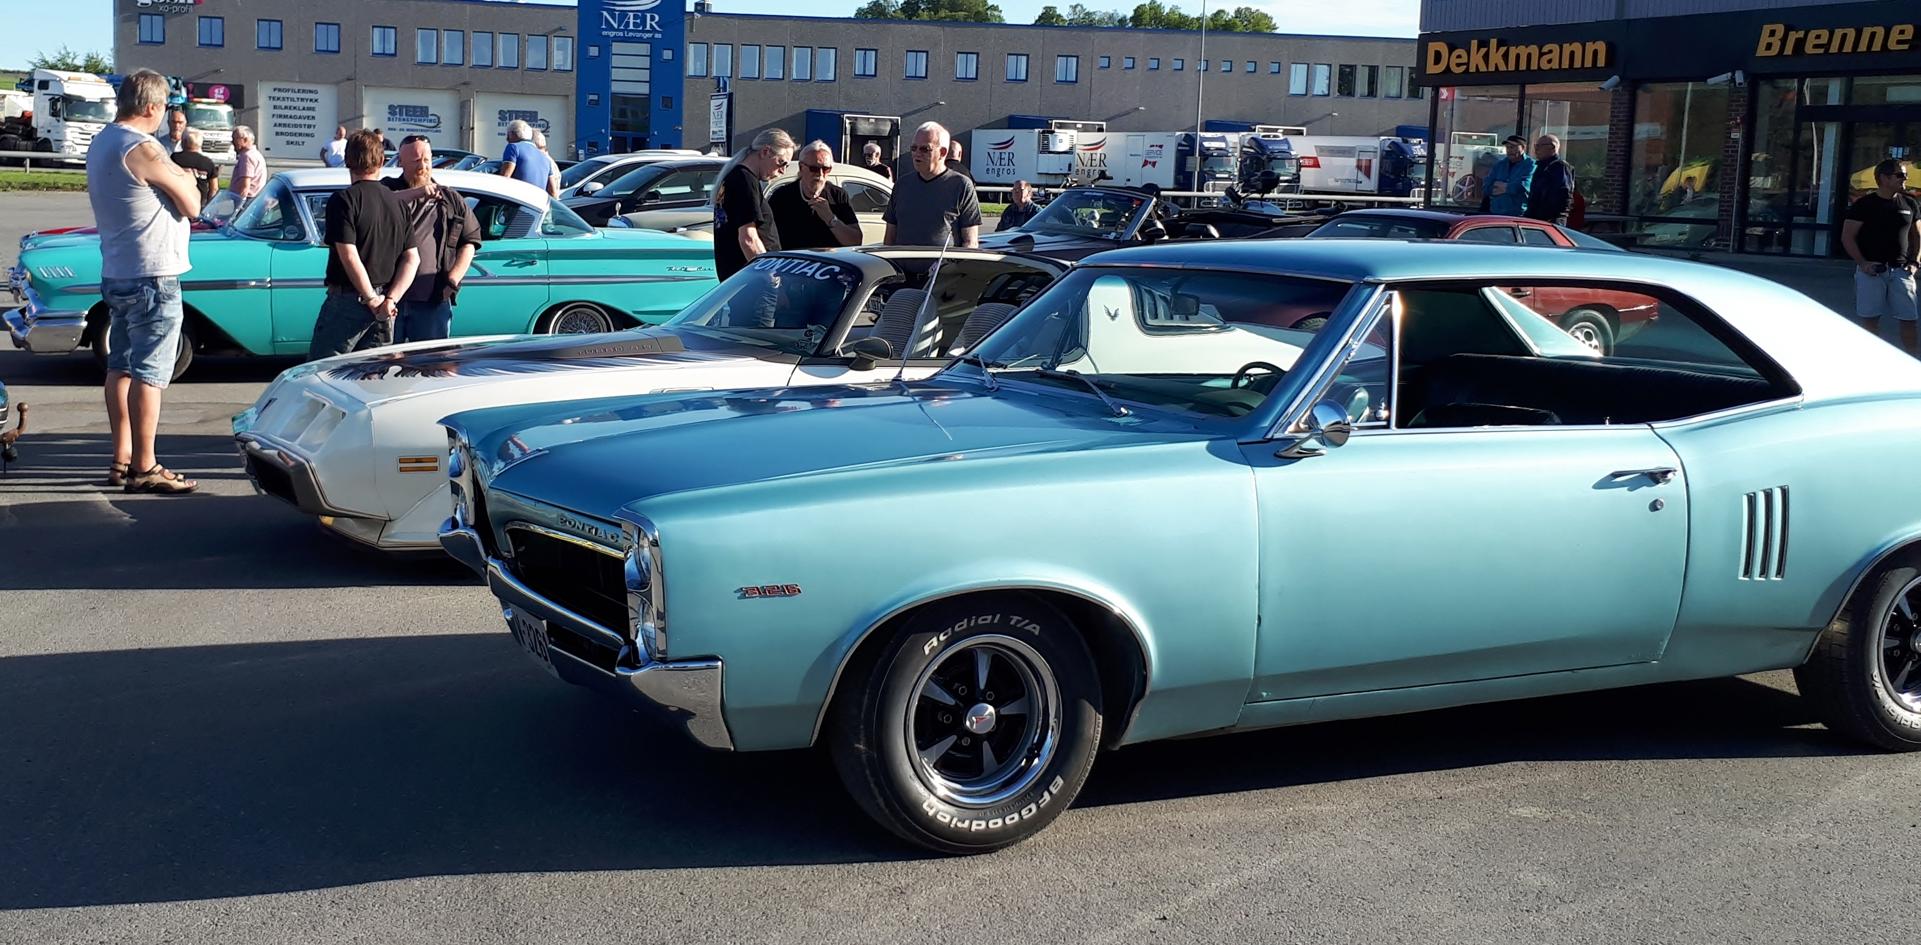 Pontiac Turbo Trans am og fremst Pontiac GTO